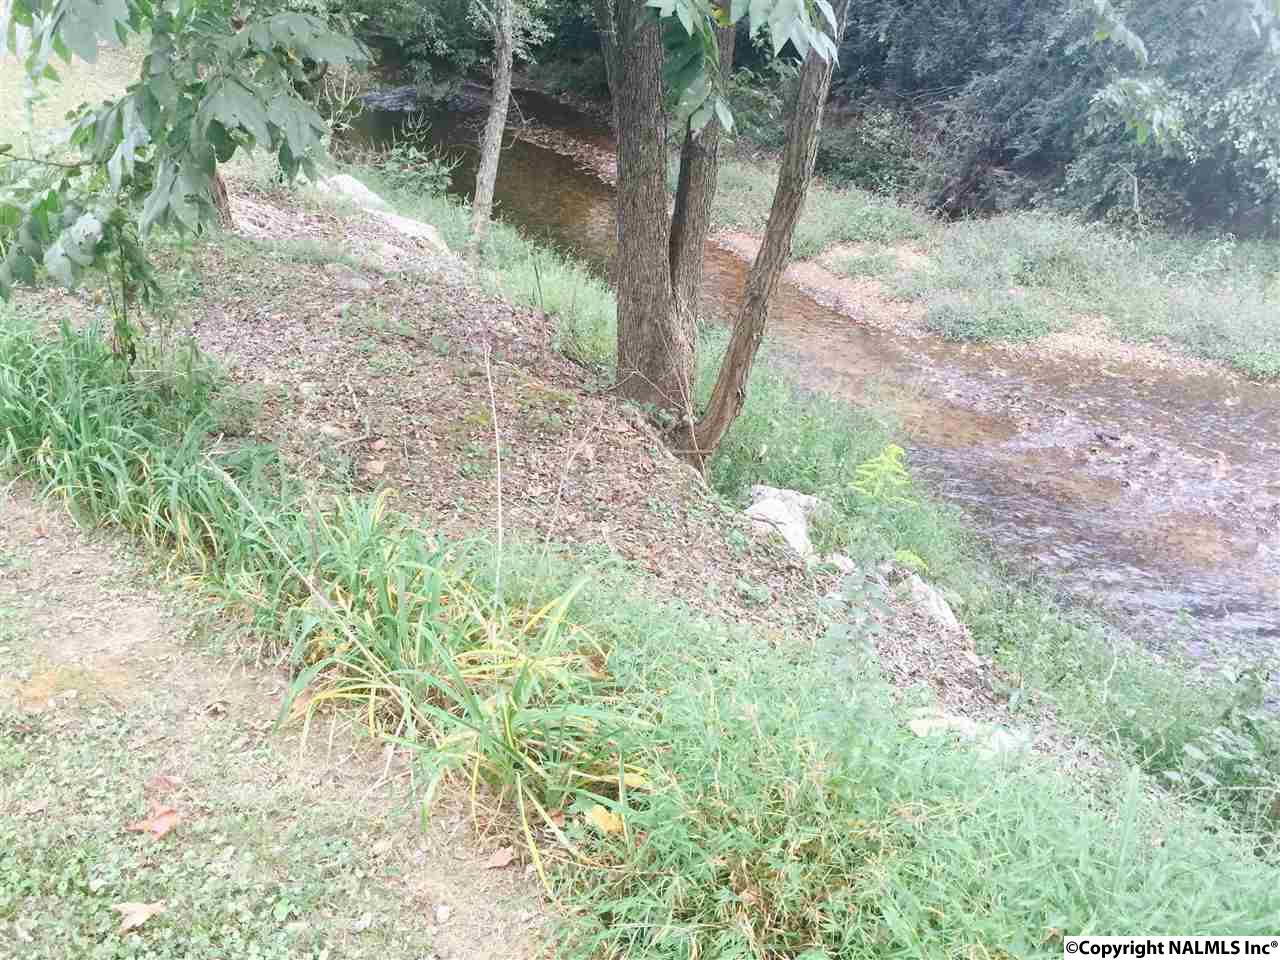 Alabama limestone county capshaw - Alabama Limestone County Capshaw 43